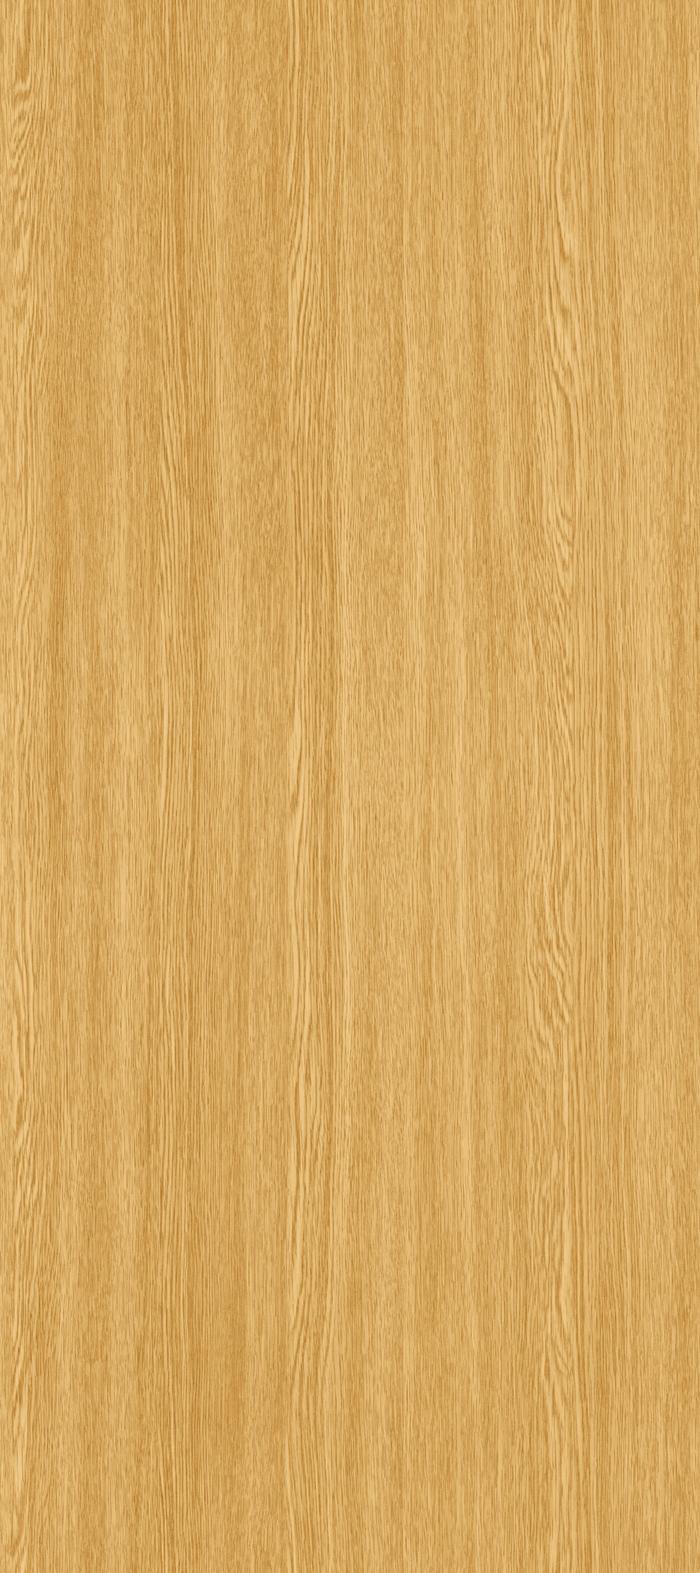 Sheet Materials Gt Melamine Panels Woodworkers